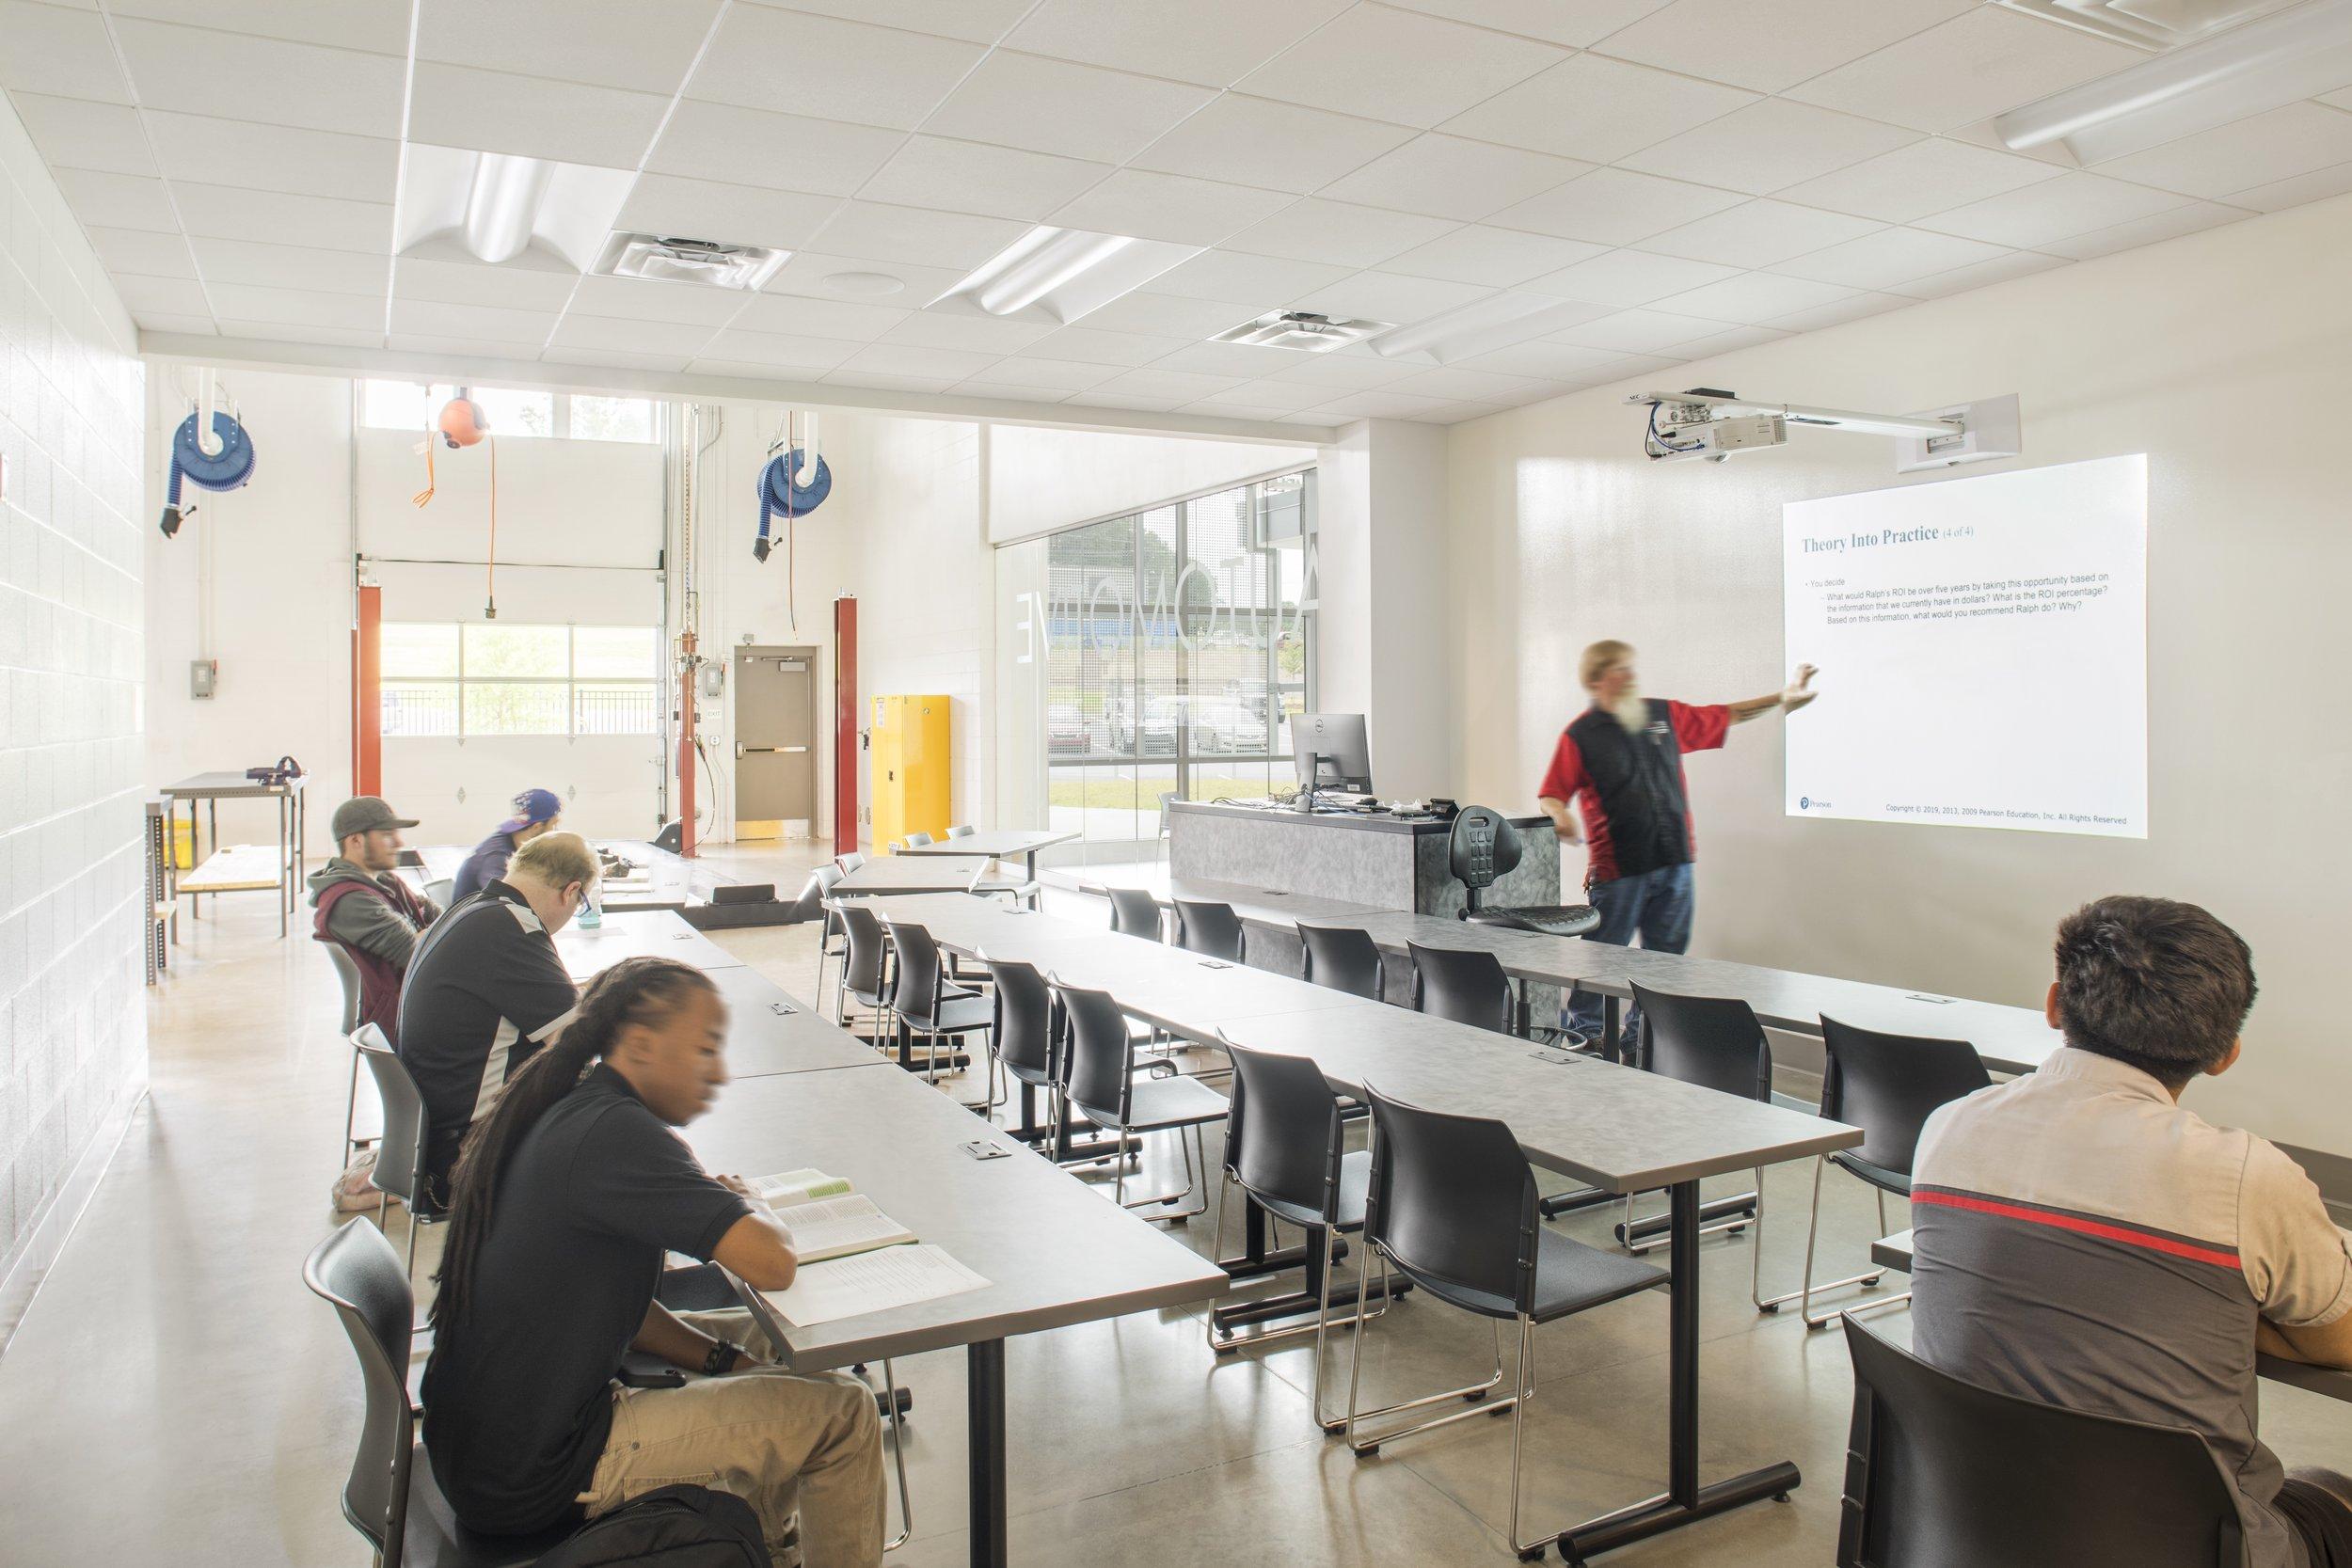 ADW-Higher-Education-CVCC-Hickory-NC-Workforce-Solutions-Interior-Classroom.jpg